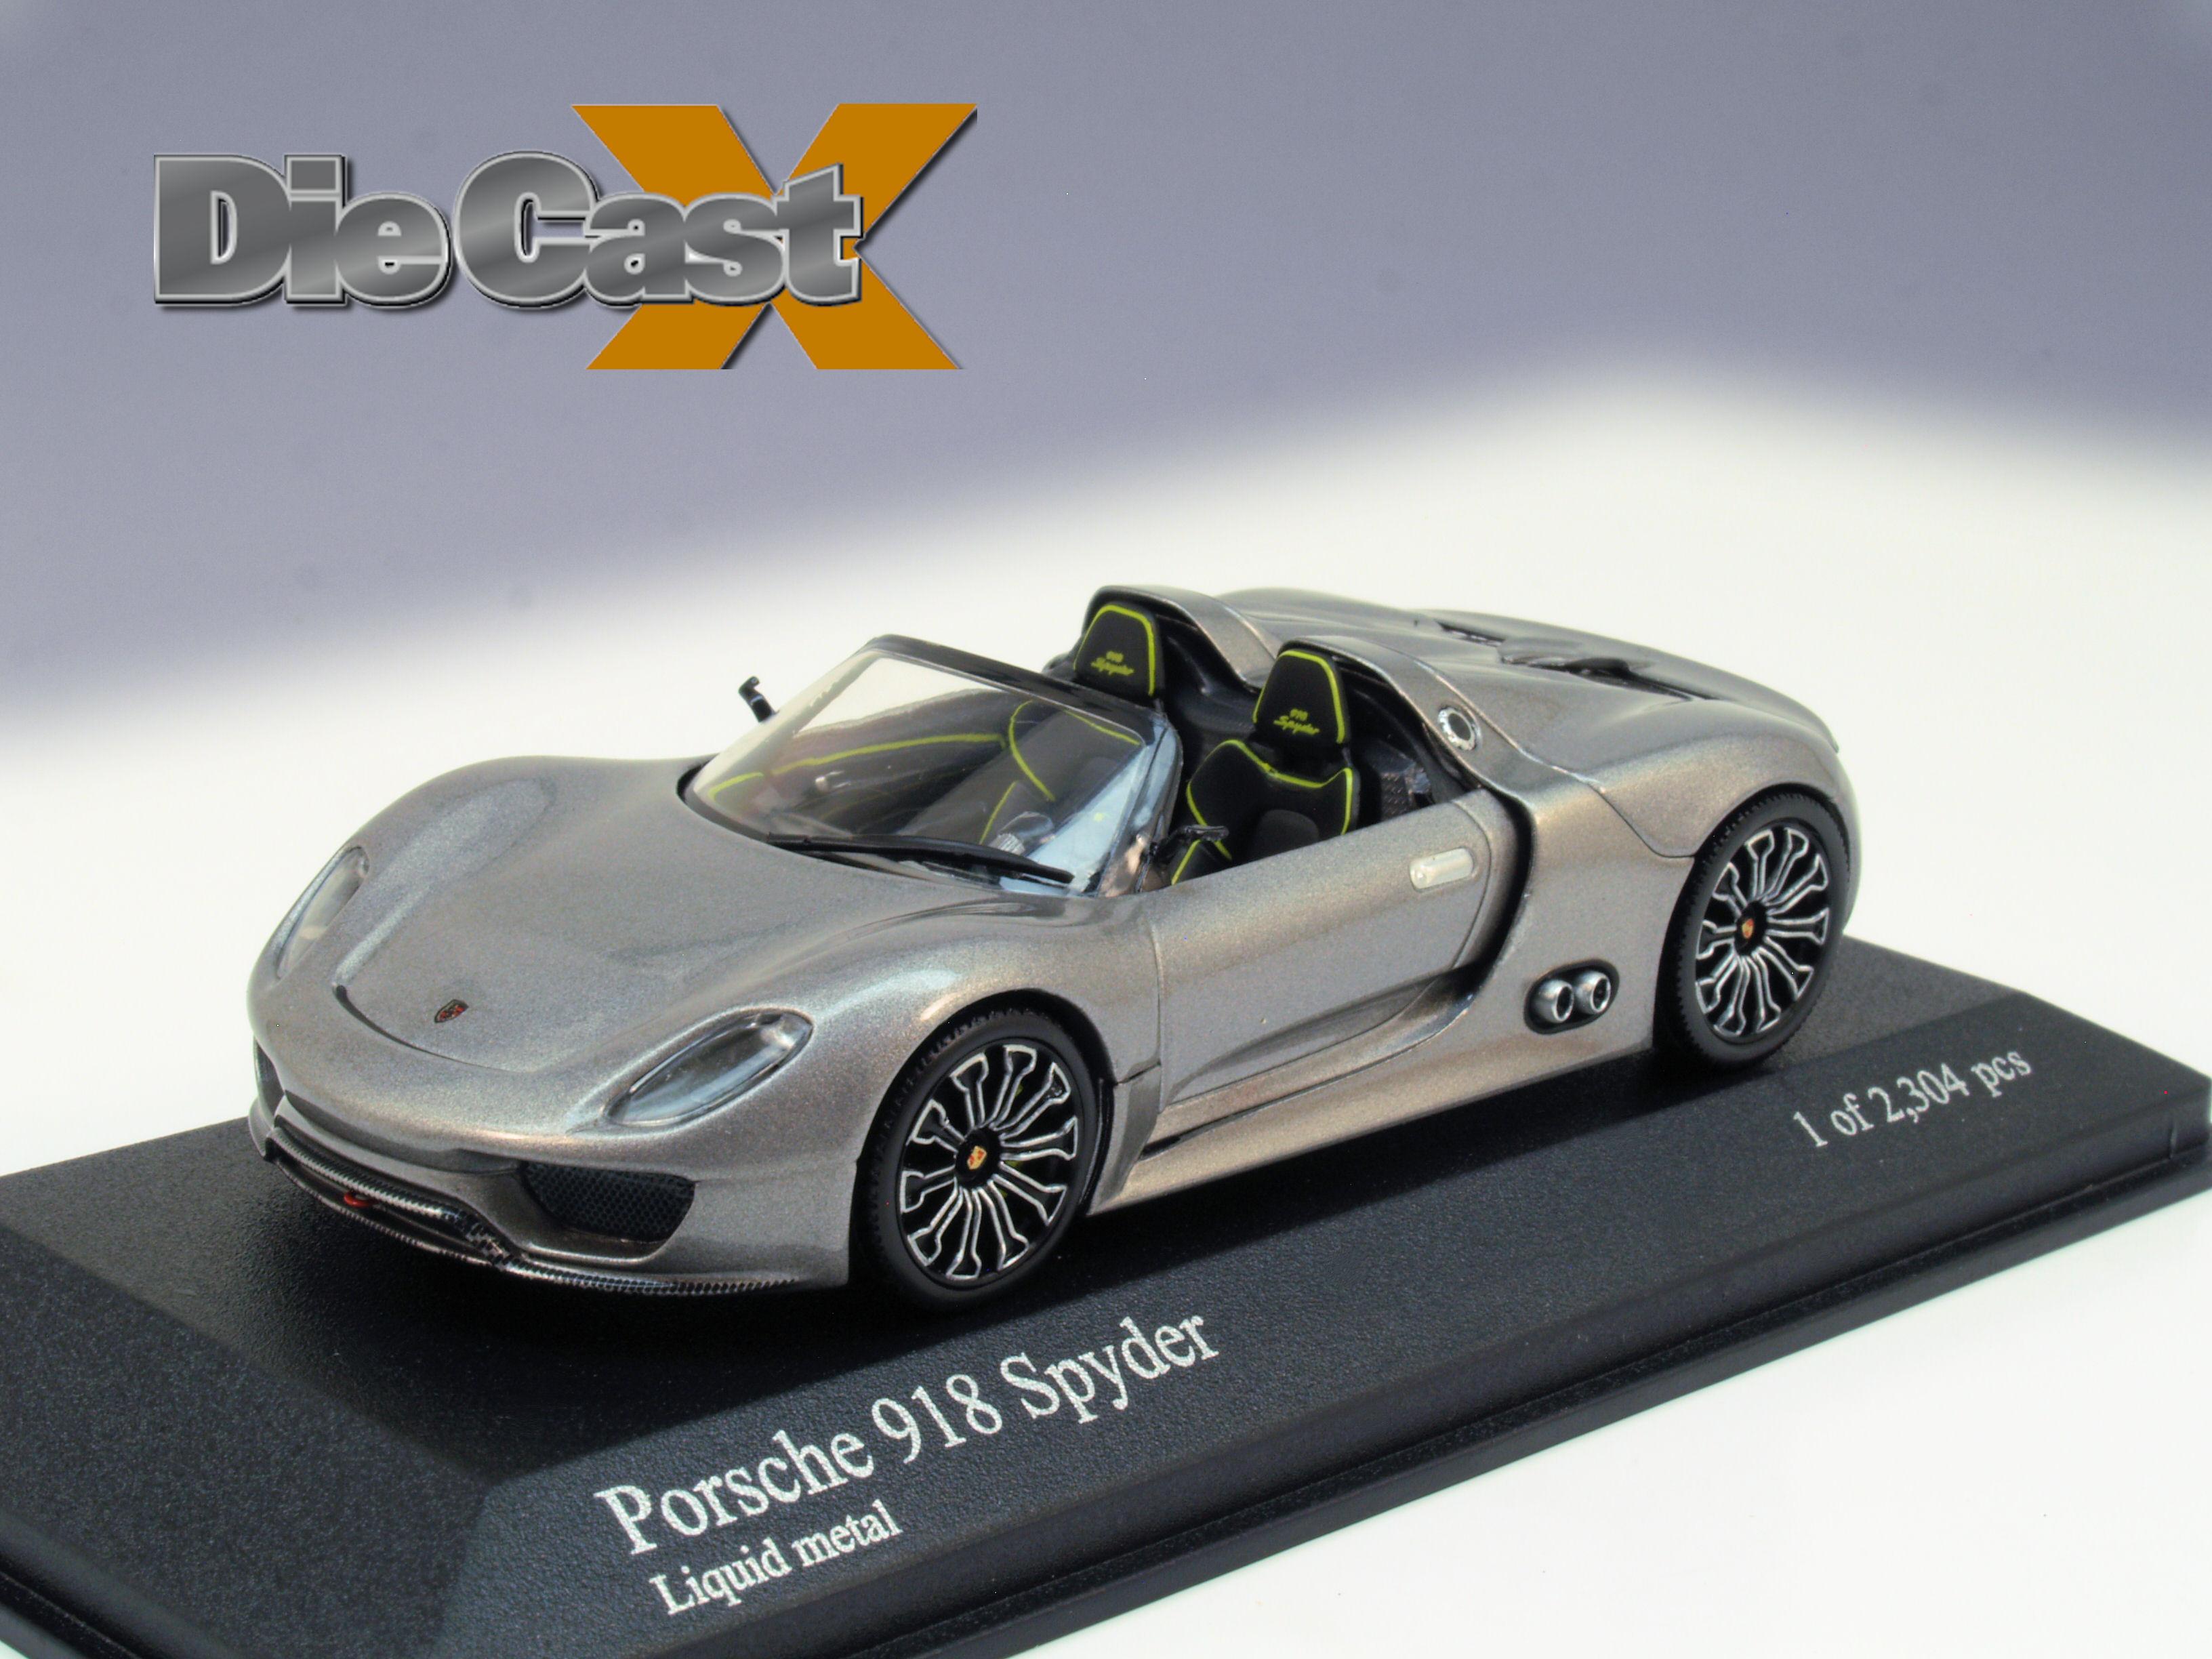 Minichamps 1 43 Porsche 918 Spyder Electric Slide